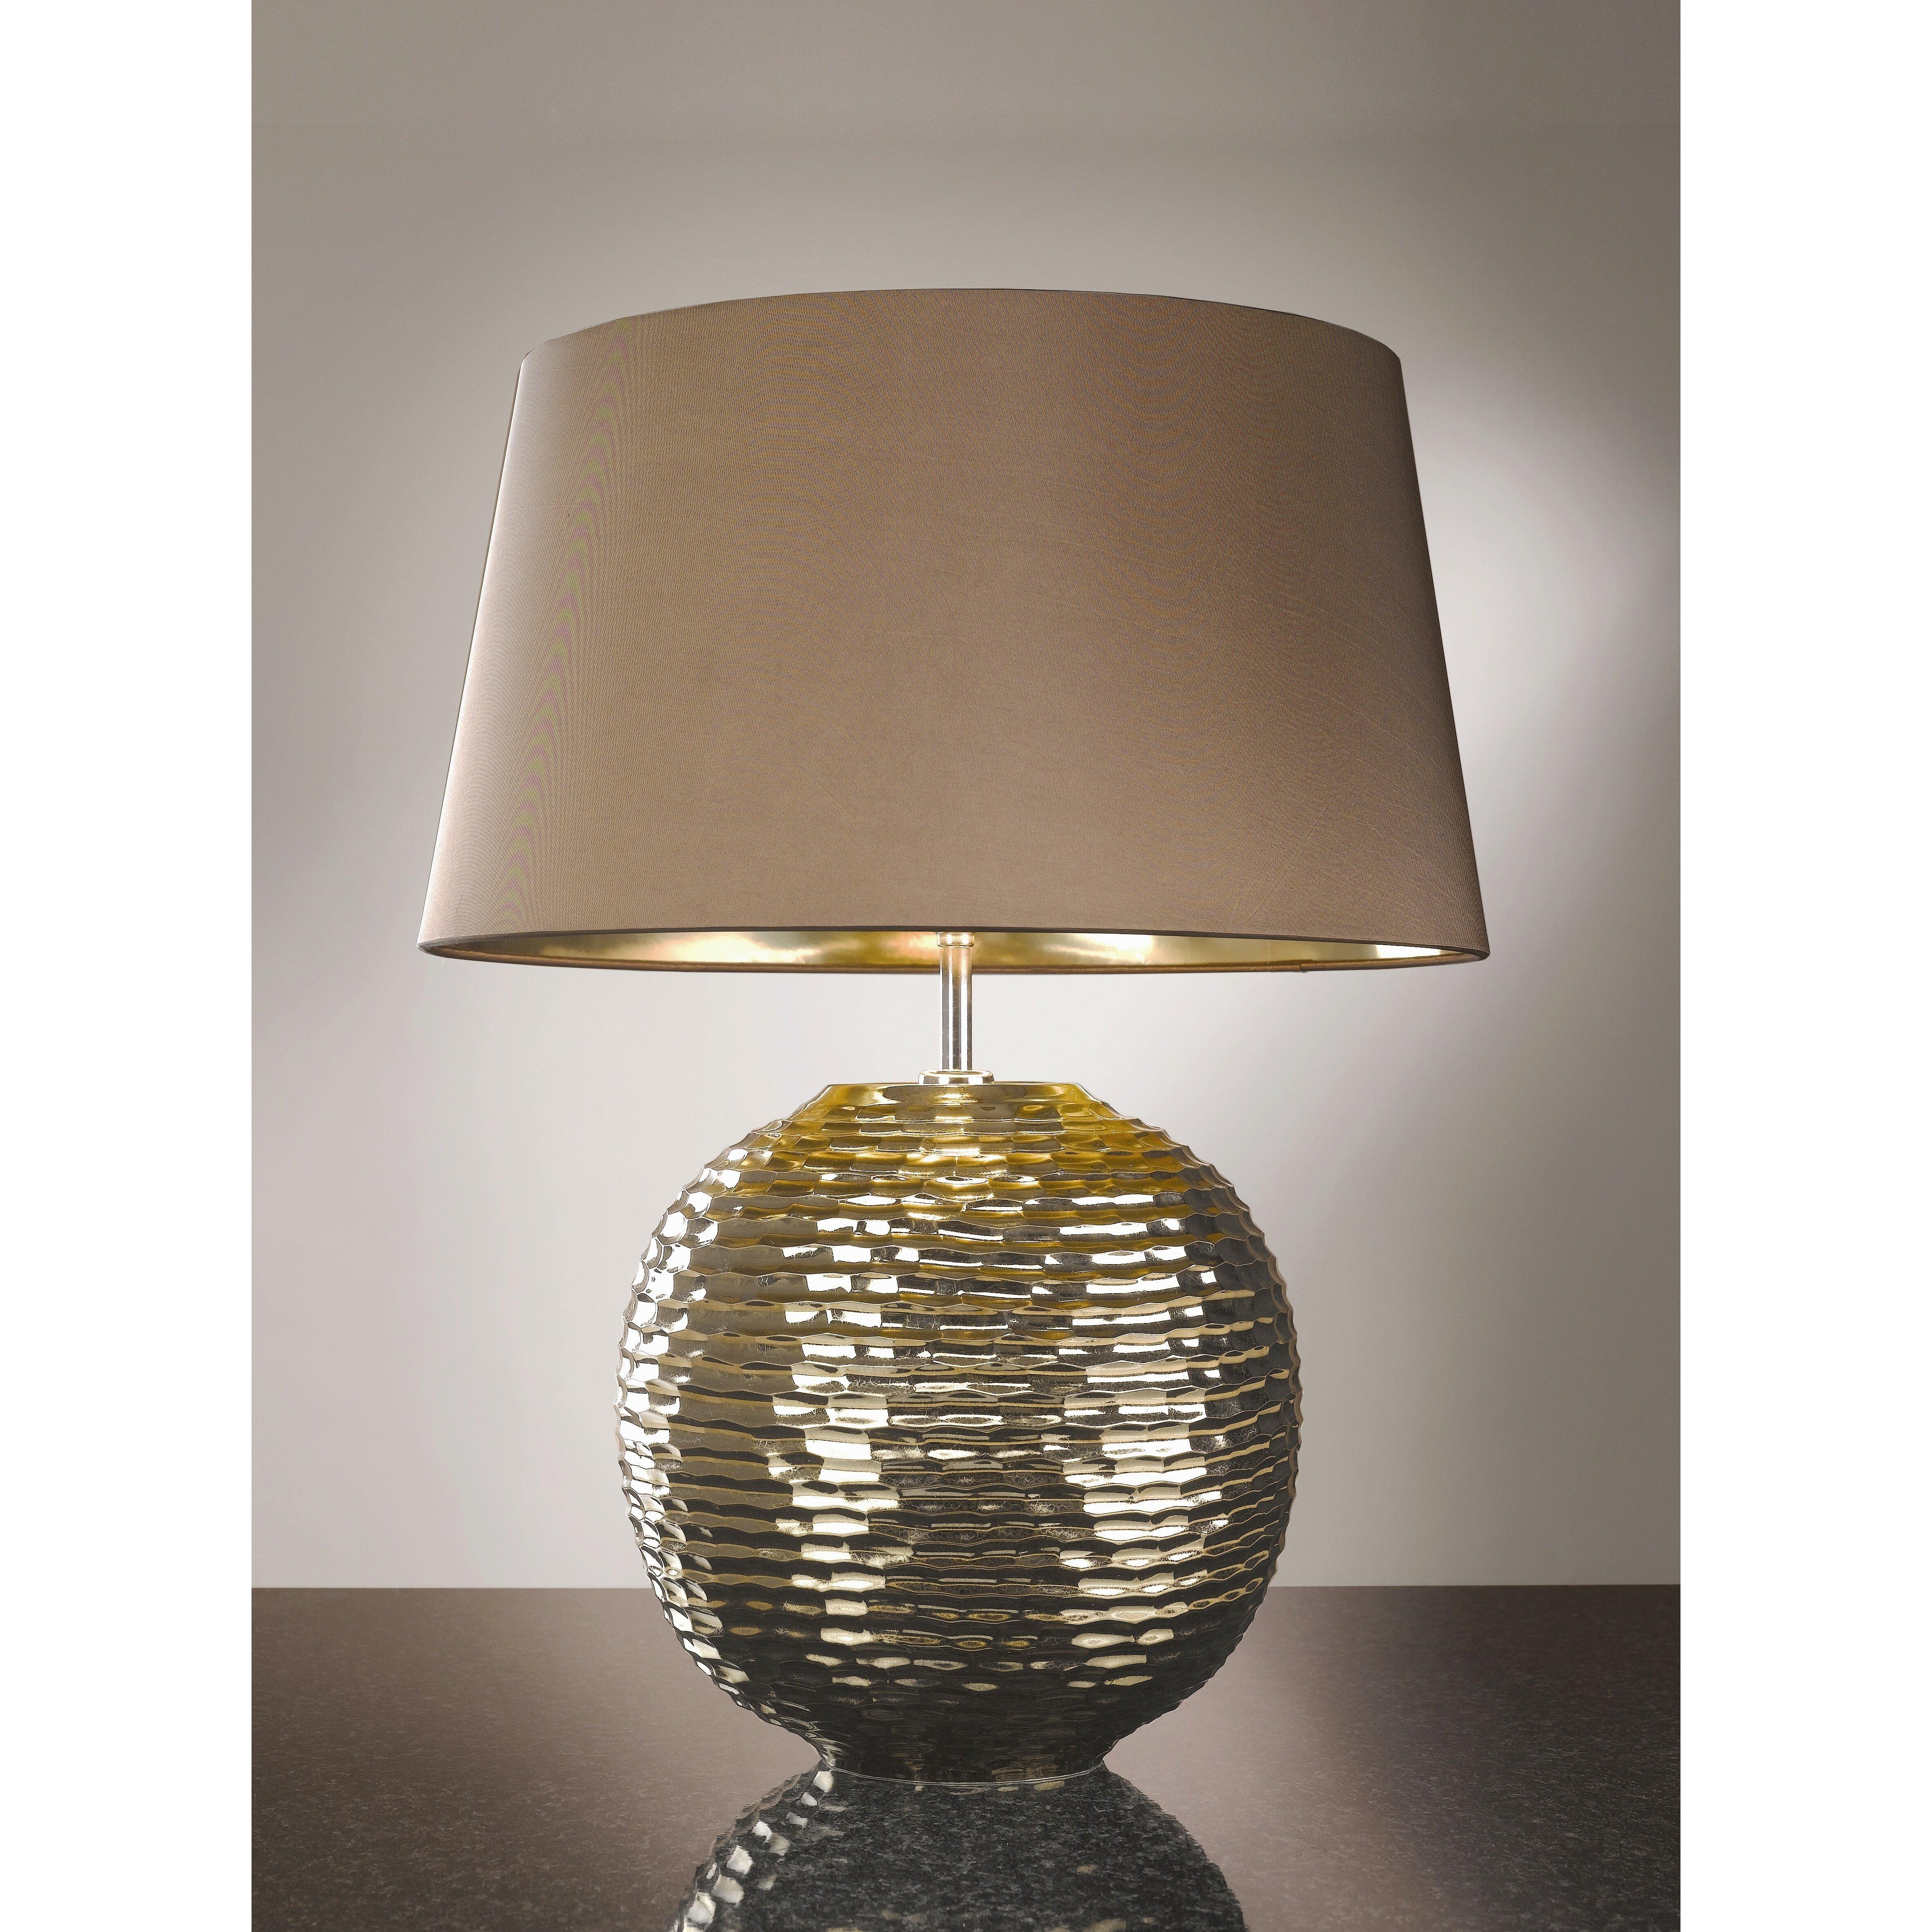 elstead lighting luis 57cm table lamp wayfair uk. Black Bedroom Furniture Sets. Home Design Ideas